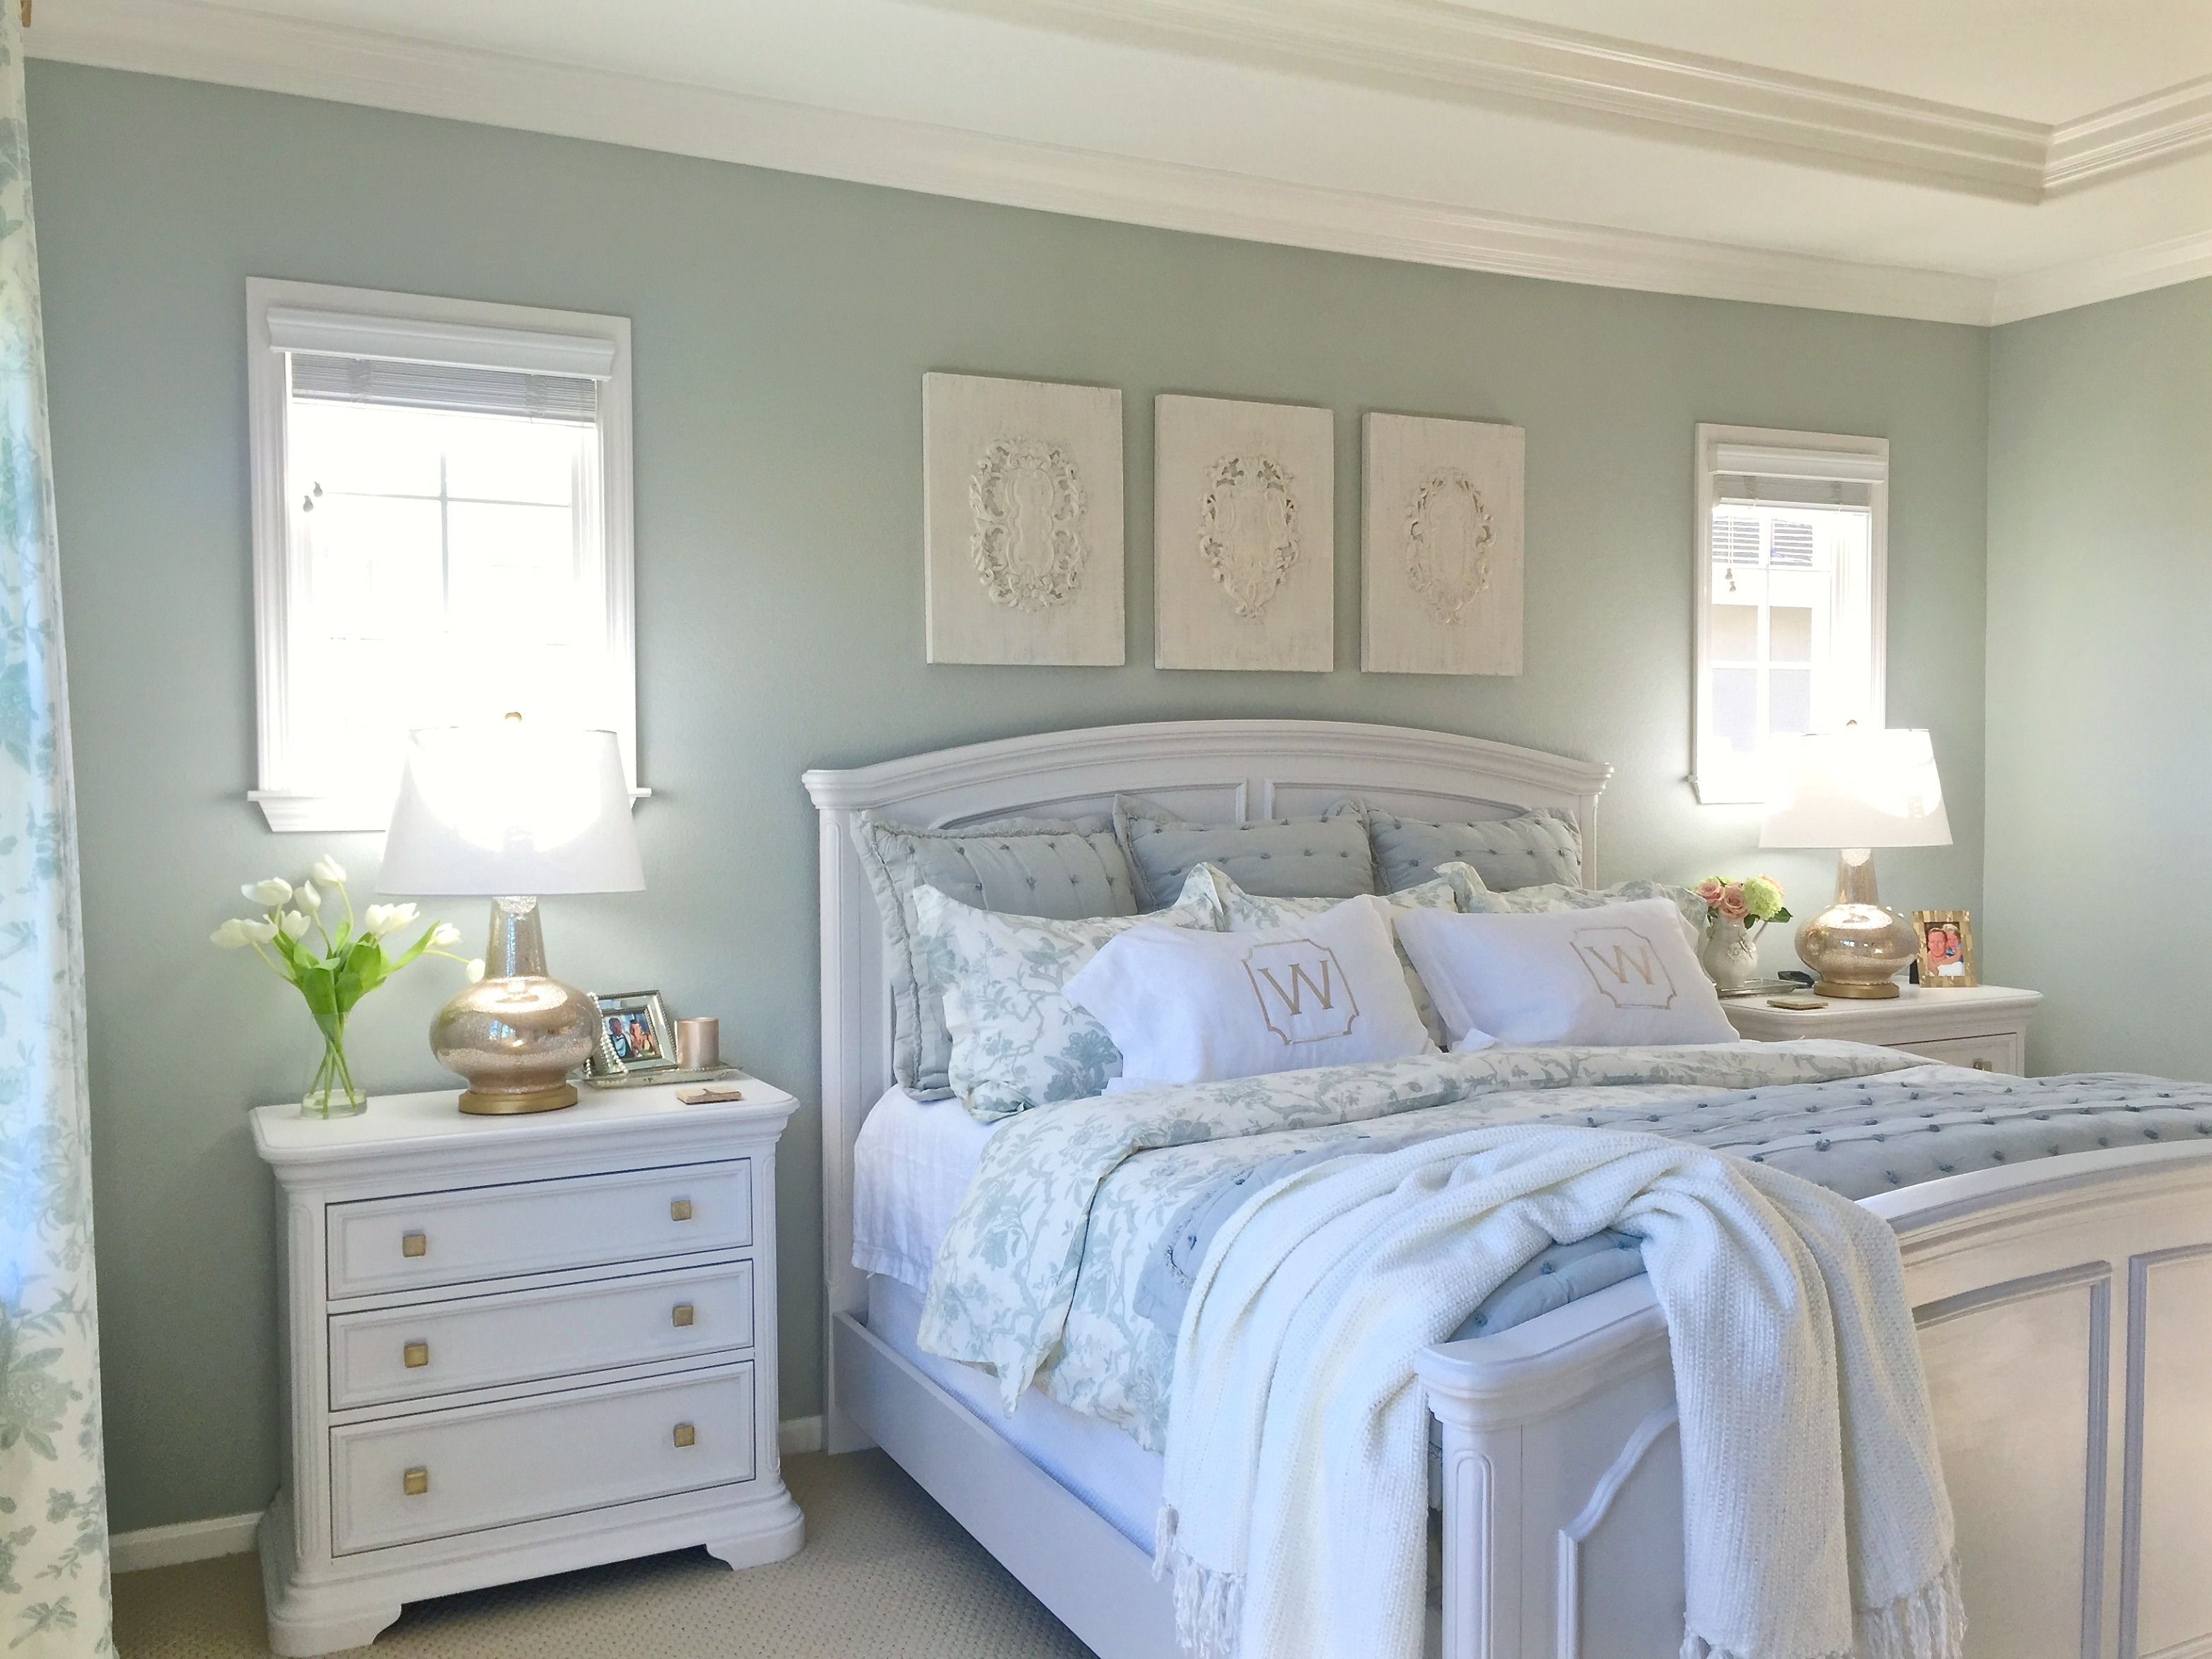 Master Bedroom Reveal with Ballard Designs | Discount ...